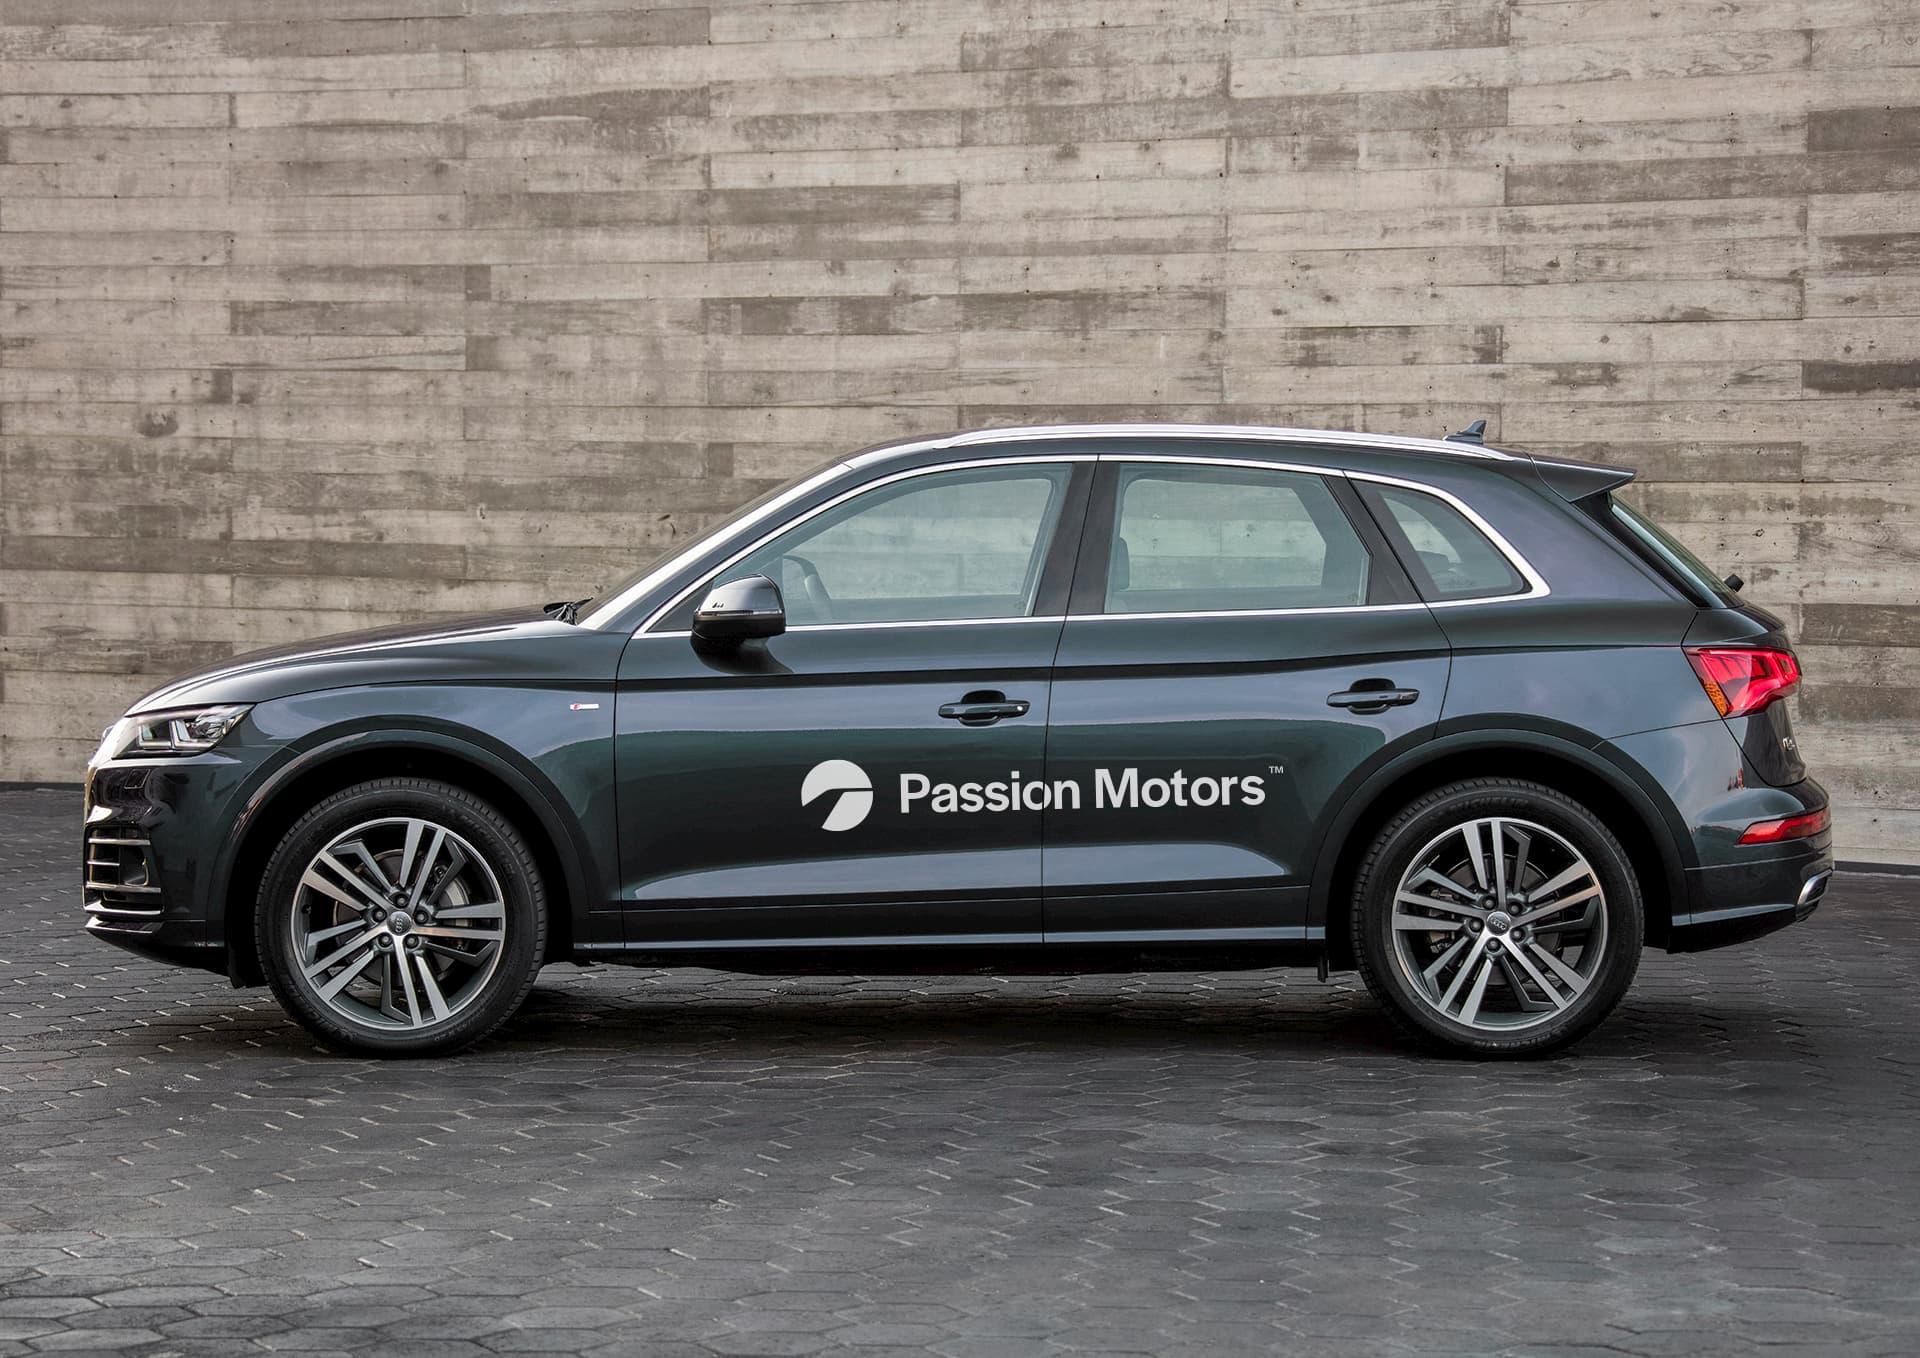 Passion Motors livery